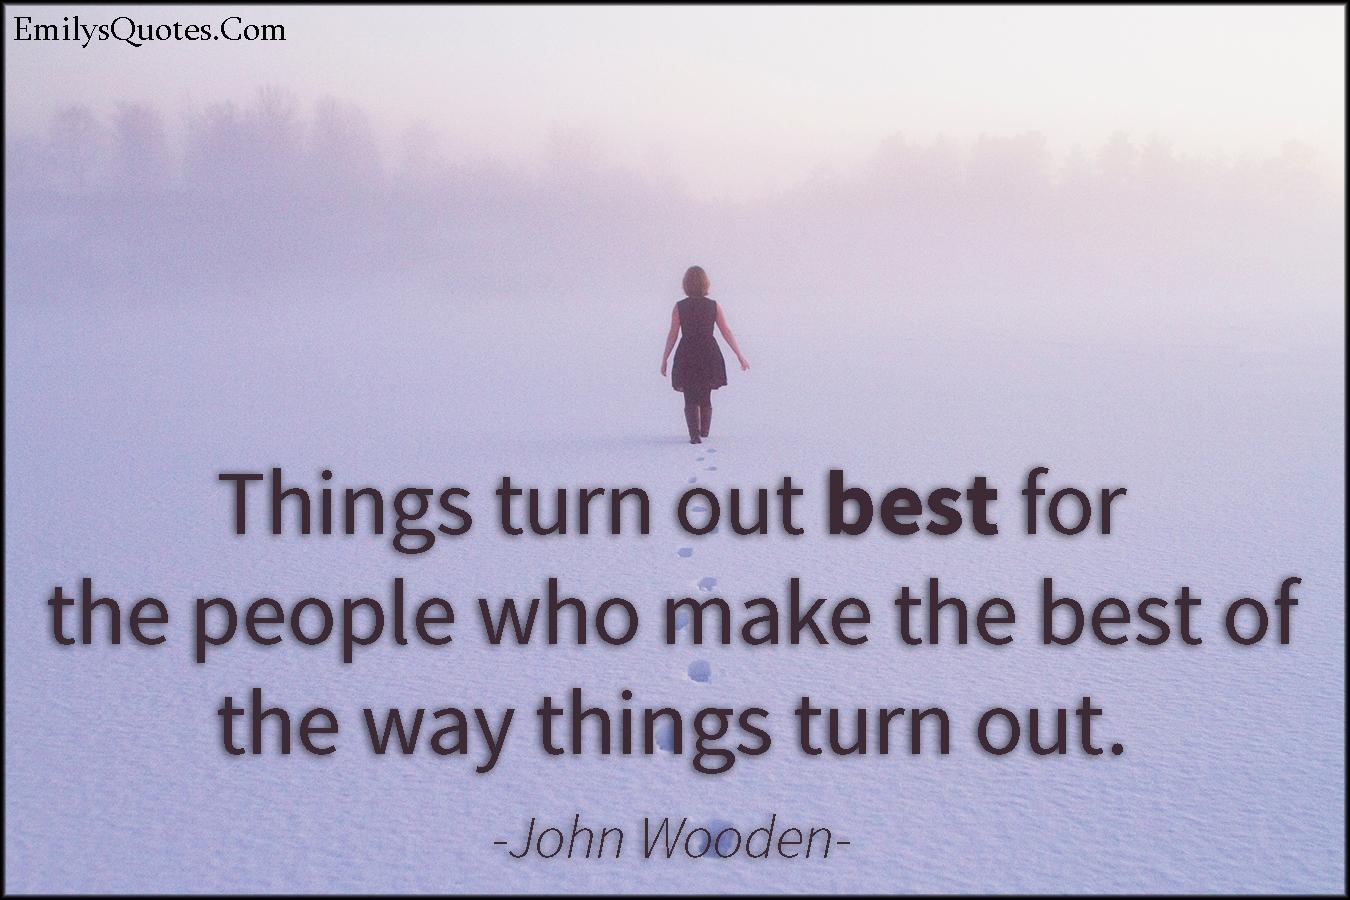 EmilysQuotes.Com - best, people, inspirational, attitude, success, John Wooden